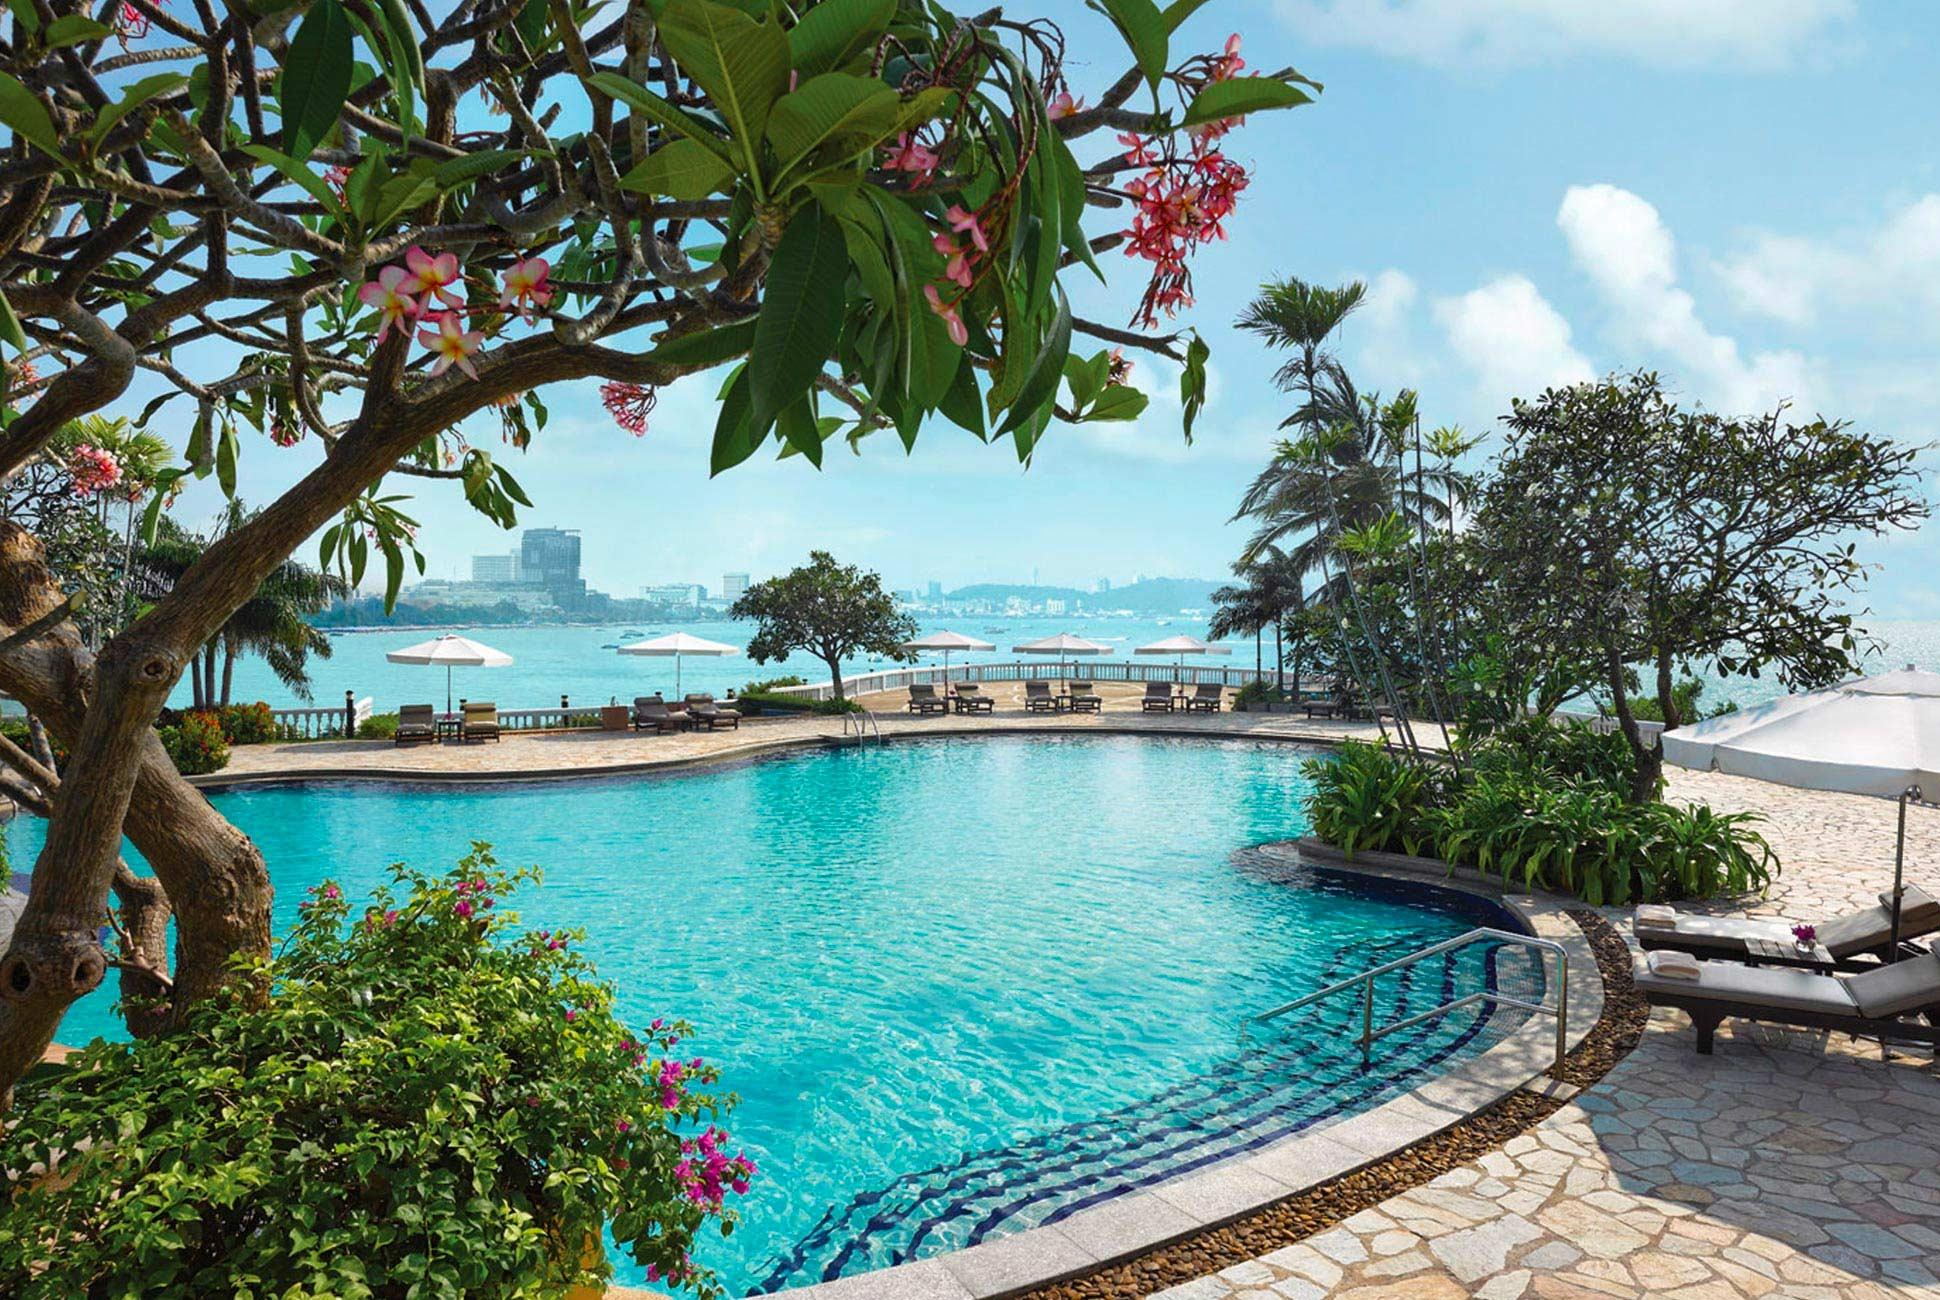 Pool of the Dusit Thani Pattaya Hotel